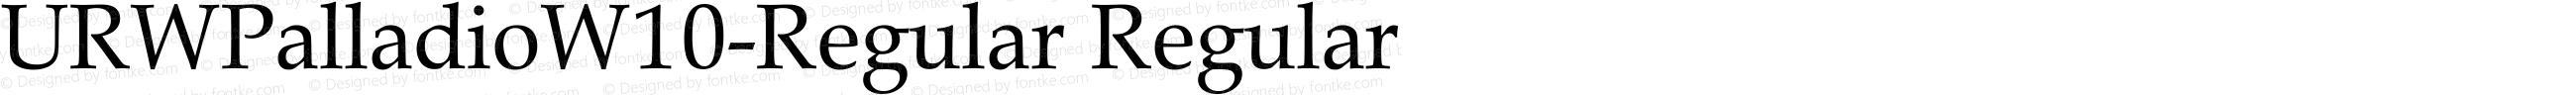 URWPalladioW10-Regular Regular